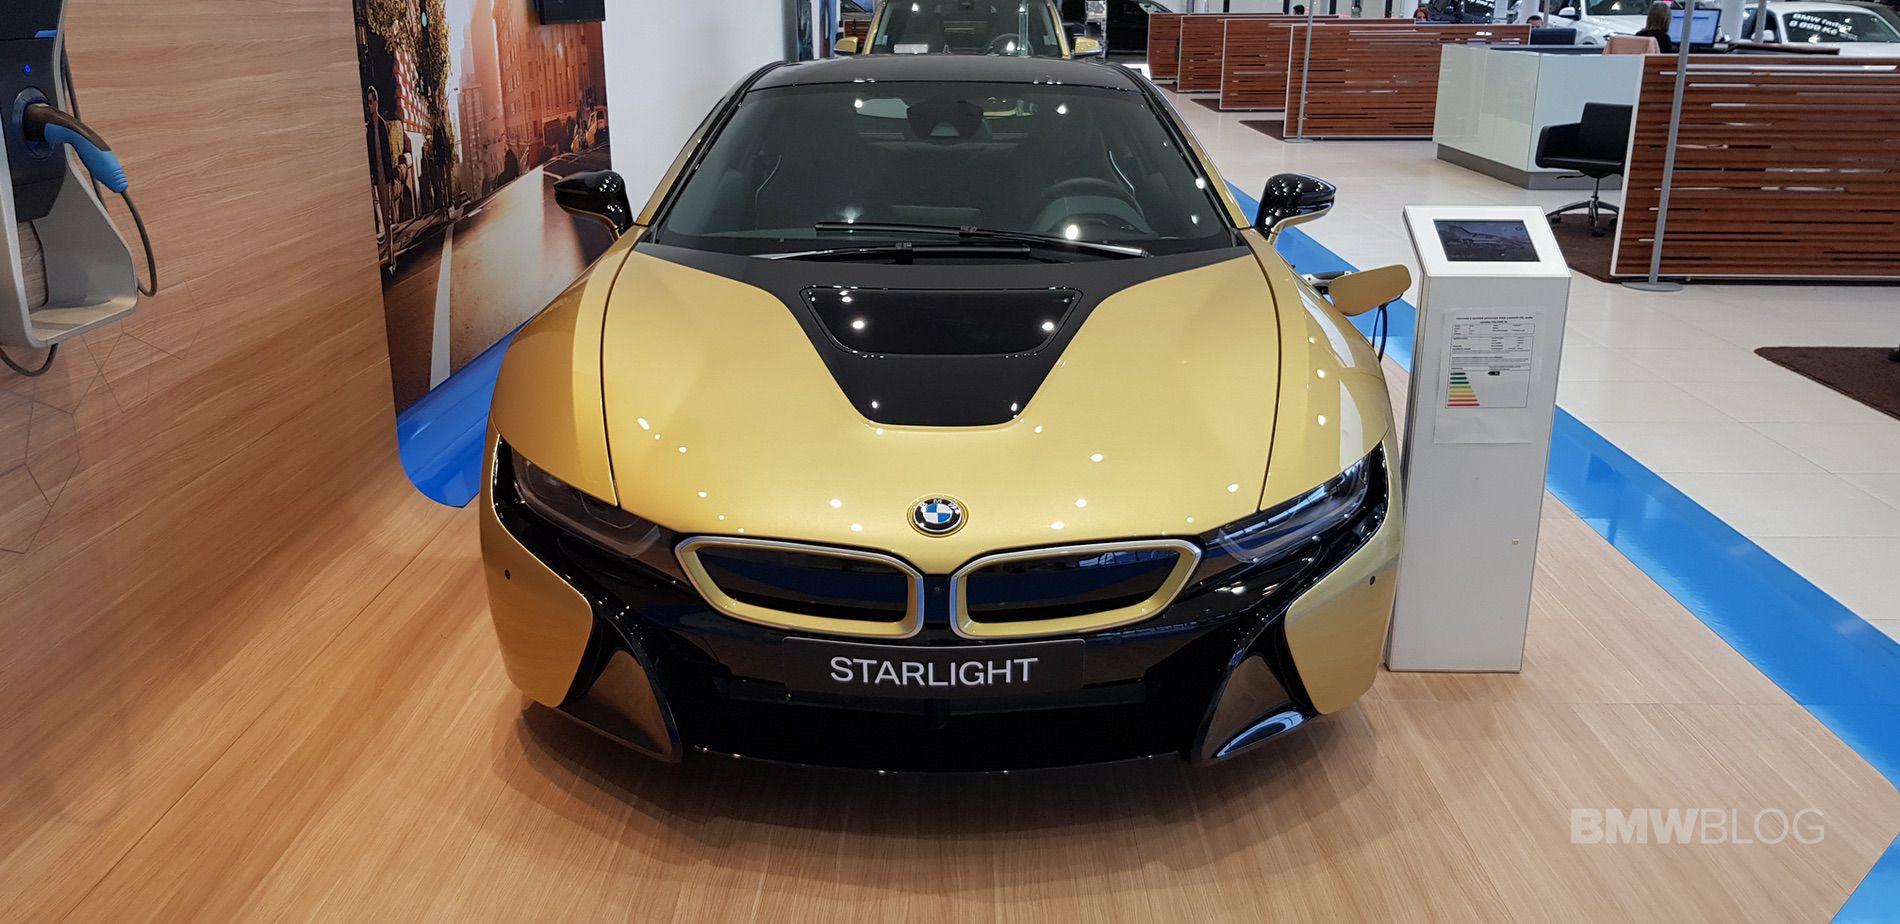 BMW i3 i8 starlight 03